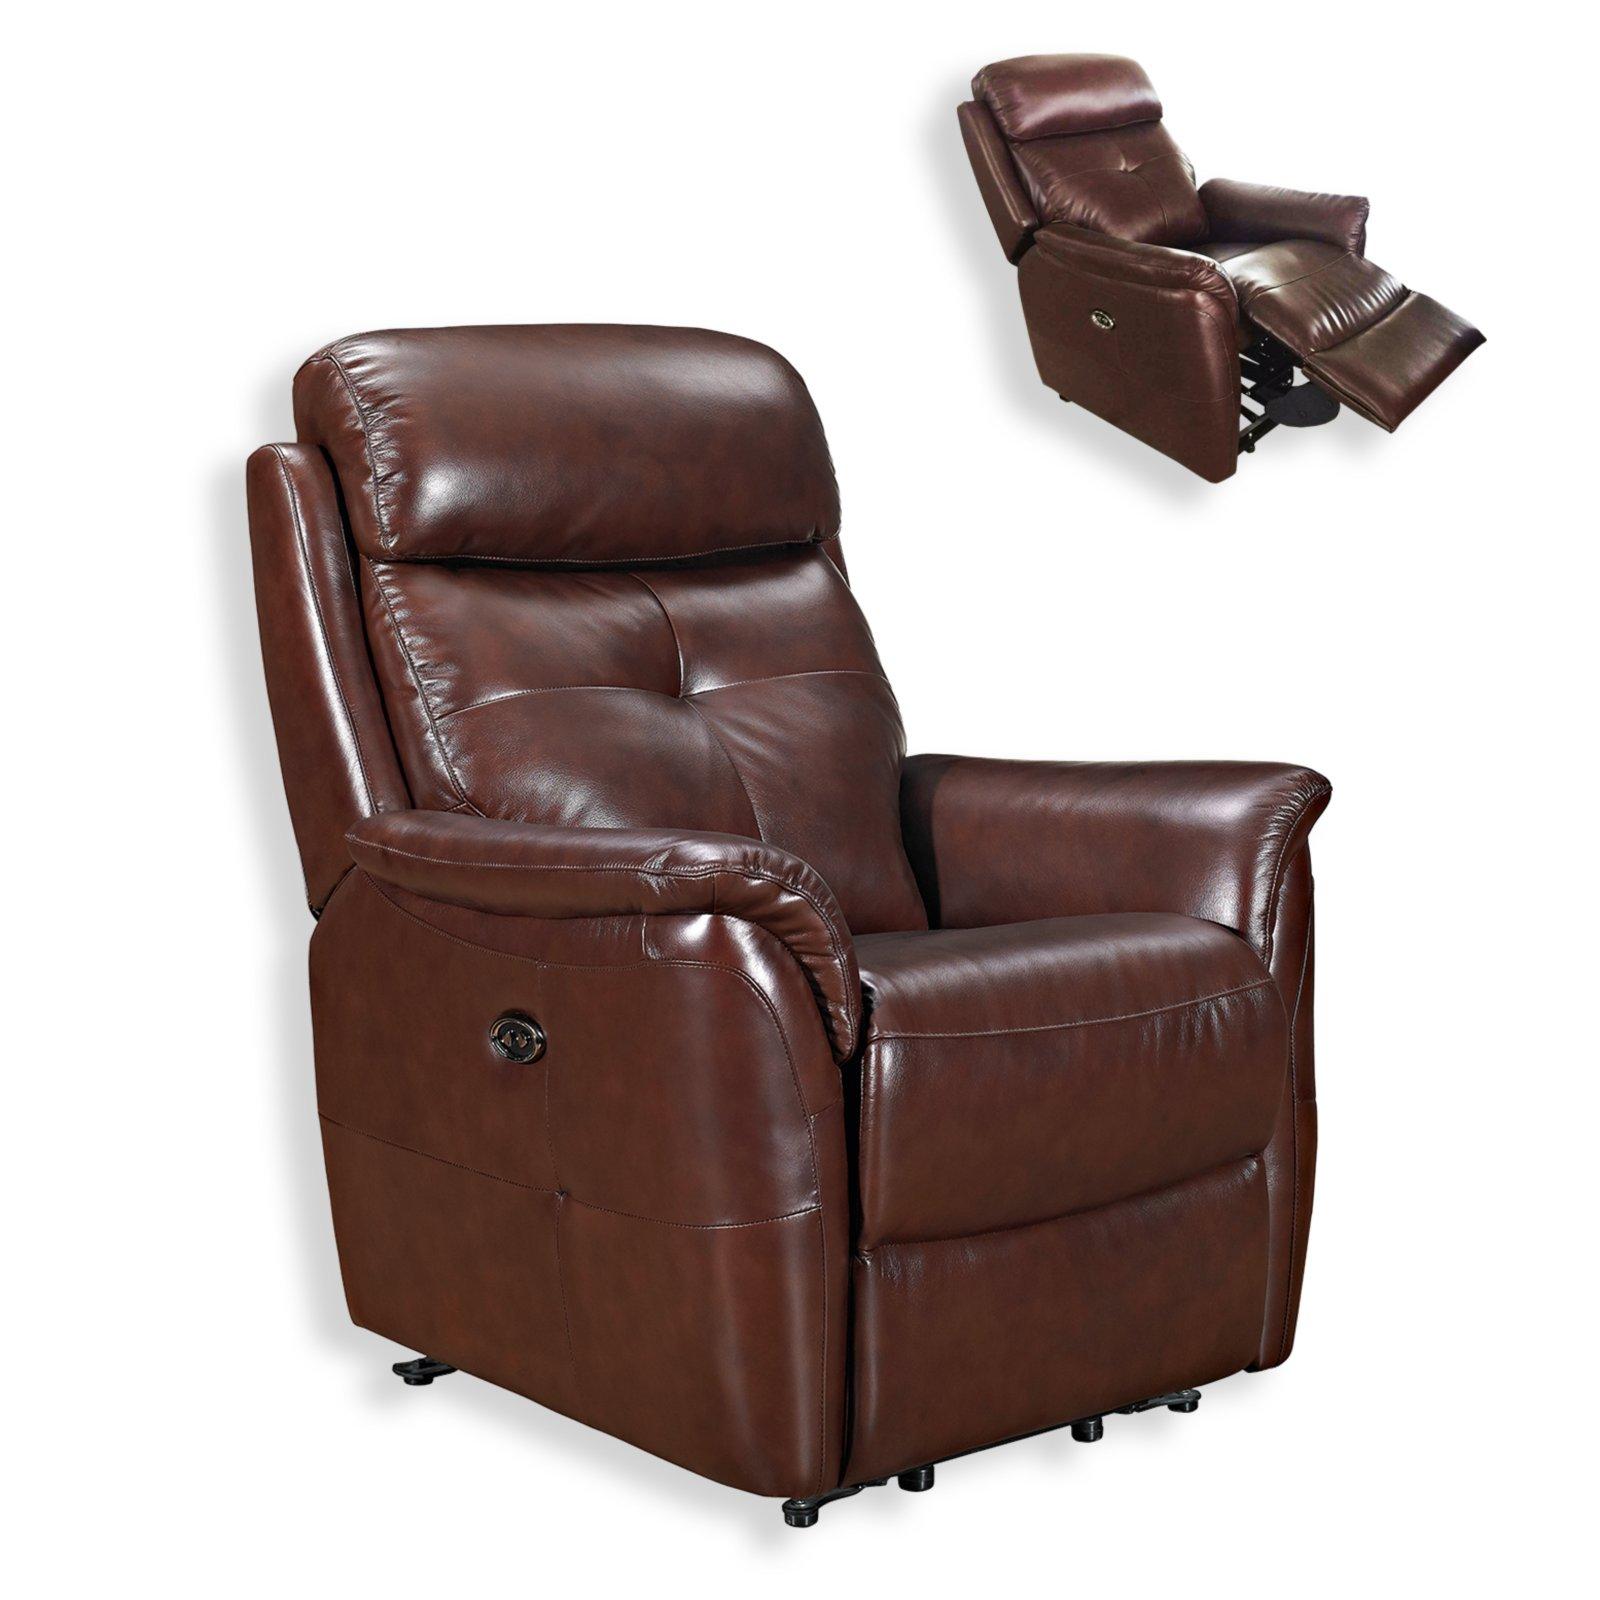 ledersessel braun taschenfederkern ledersessel sessel hocker m bel roller m belhaus. Black Bedroom Furniture Sets. Home Design Ideas